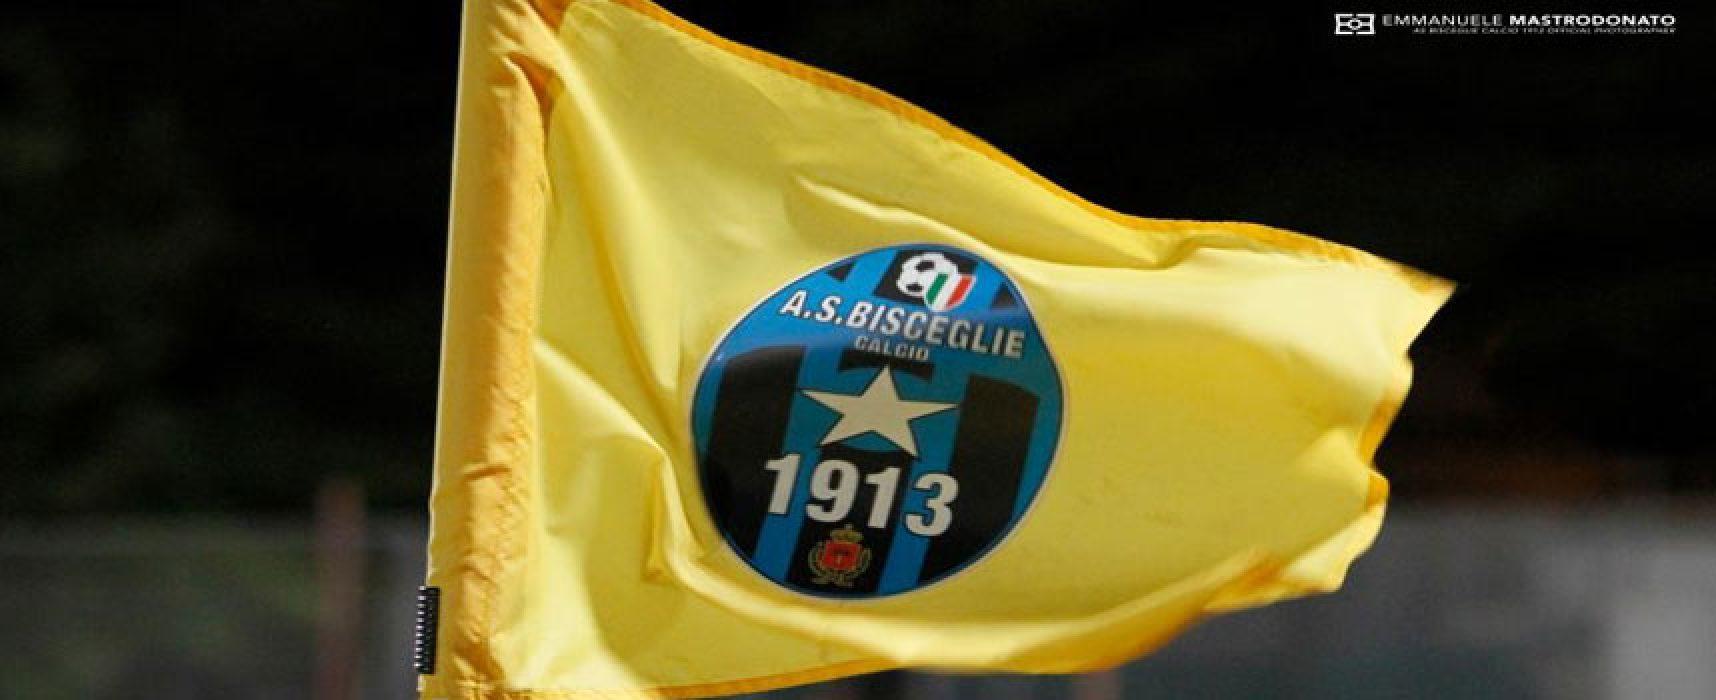 "Bisceglie Calcio, Casella: ""C'è manifestazione di interesse per eventuale cessione quote societarie"""